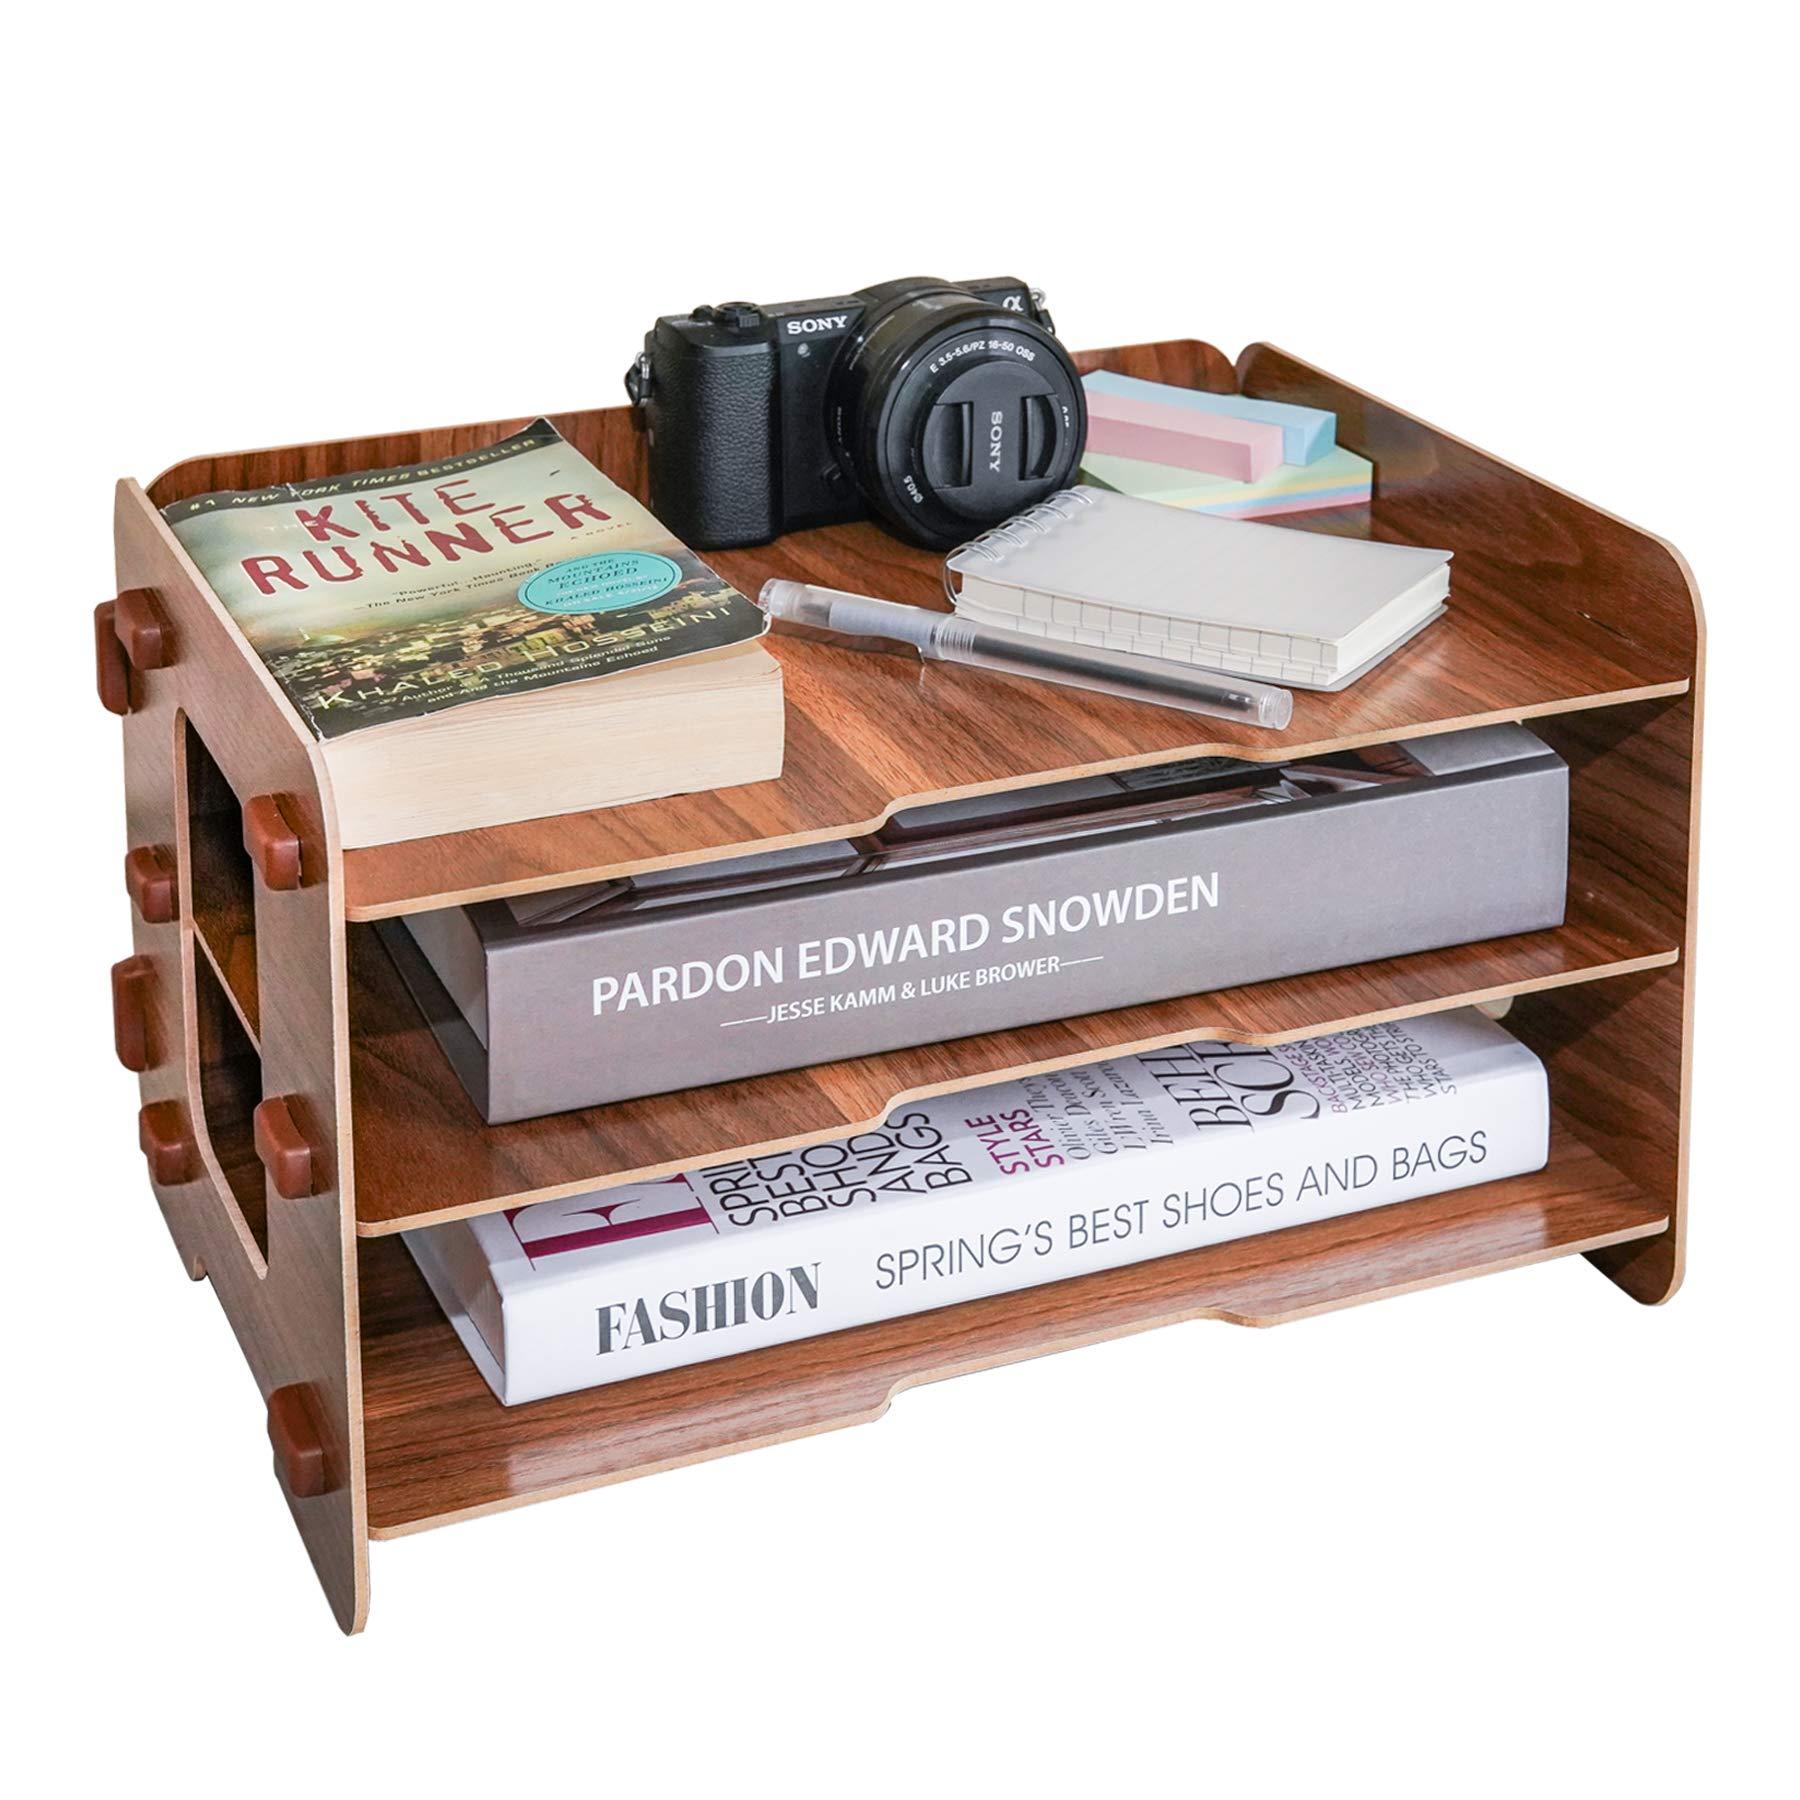 3 Layer Wood File Tray / 3 Tier Desk Organizer/Desktop Letter Tray Organizer/Files and Folder Tray/Paper Stacking Trays/Filing Organizer/Letter and Paper Organizer (Black Walnut Color)